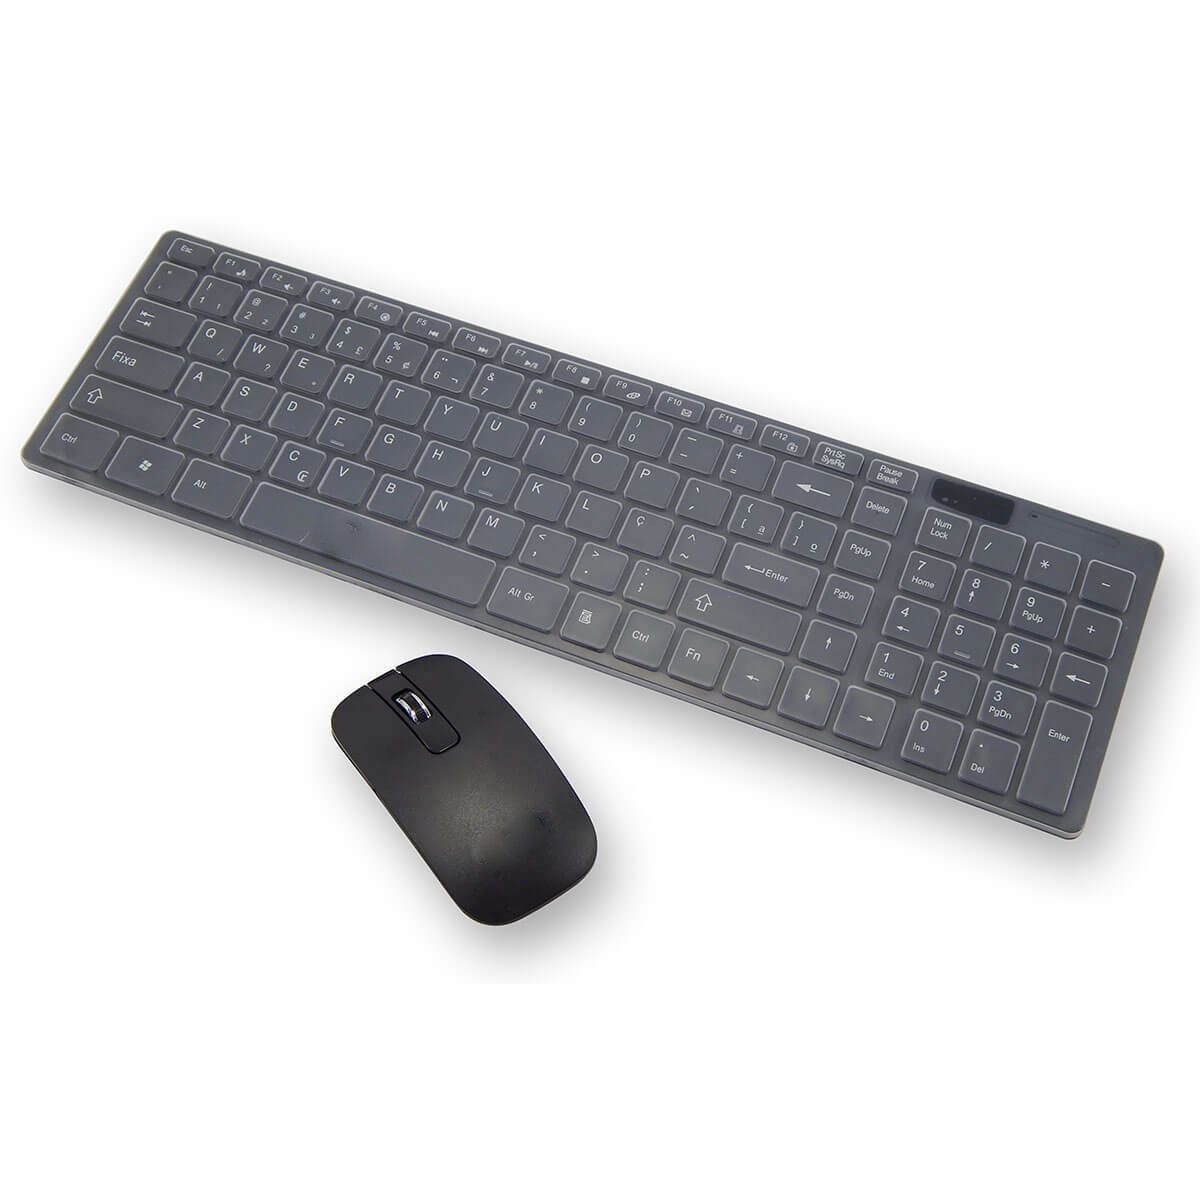 Kit Teclado e Mouse Sem fio Wifi Usb 1600Dpi 2.4Ghz Smart PC  - HARDFAST INFORMÁTICA